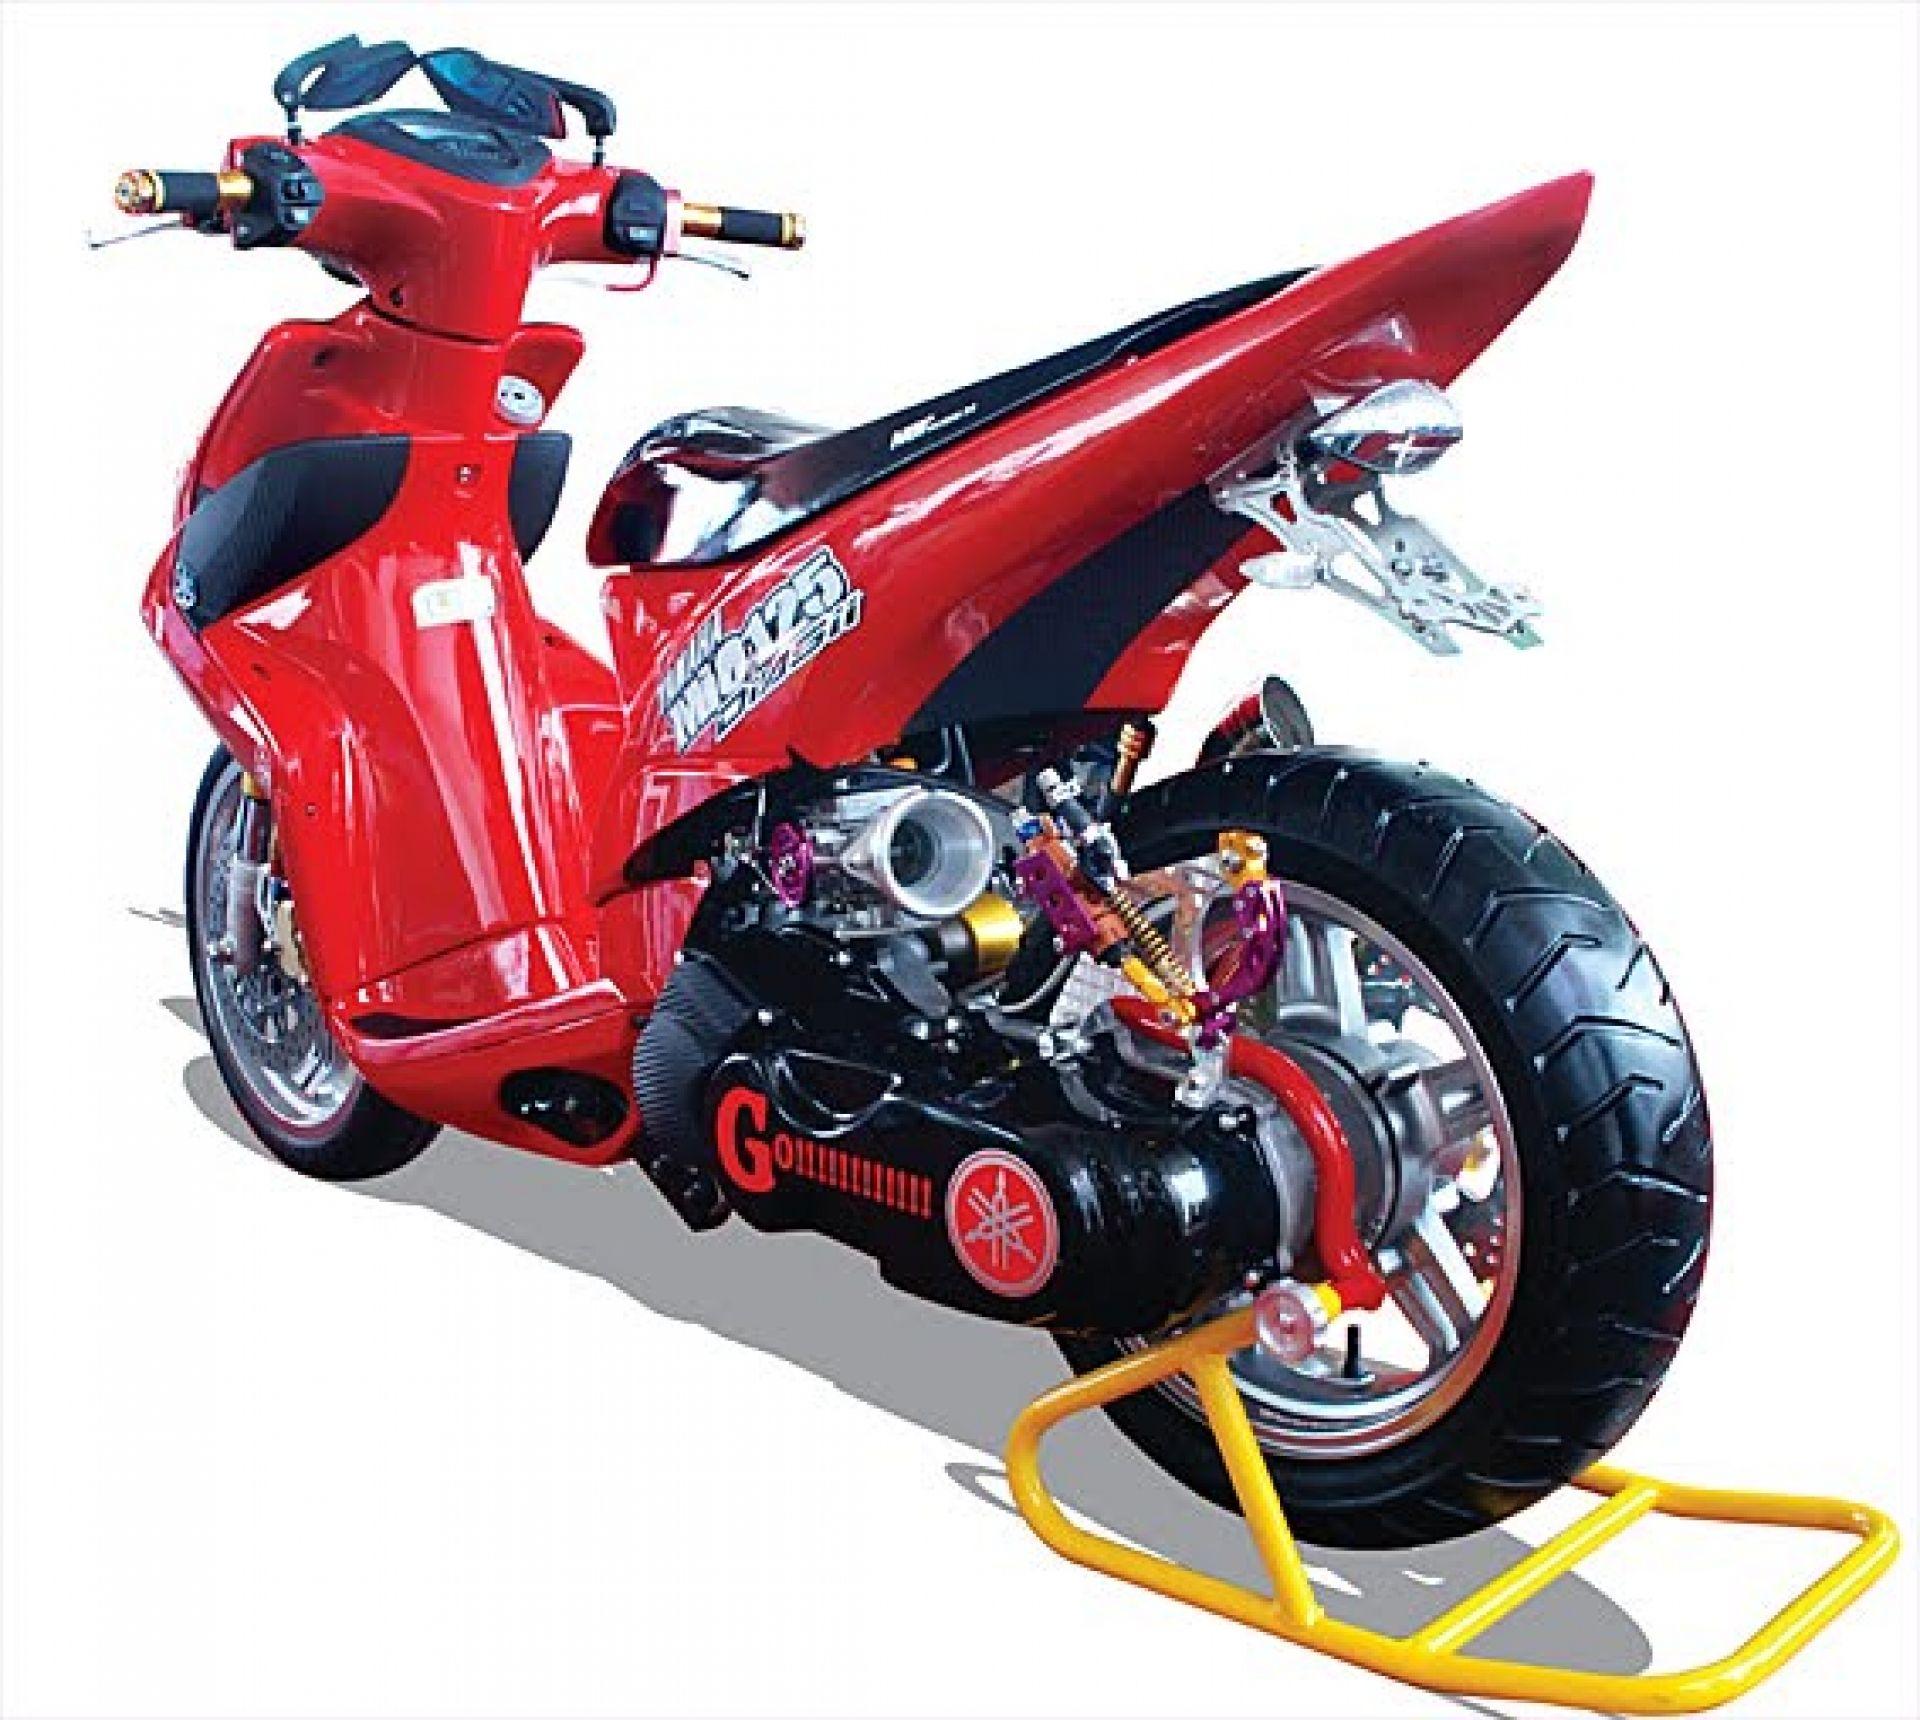 Kumpulan Modifikasi Motor Mio Im3 Terbaru Kampong Motor